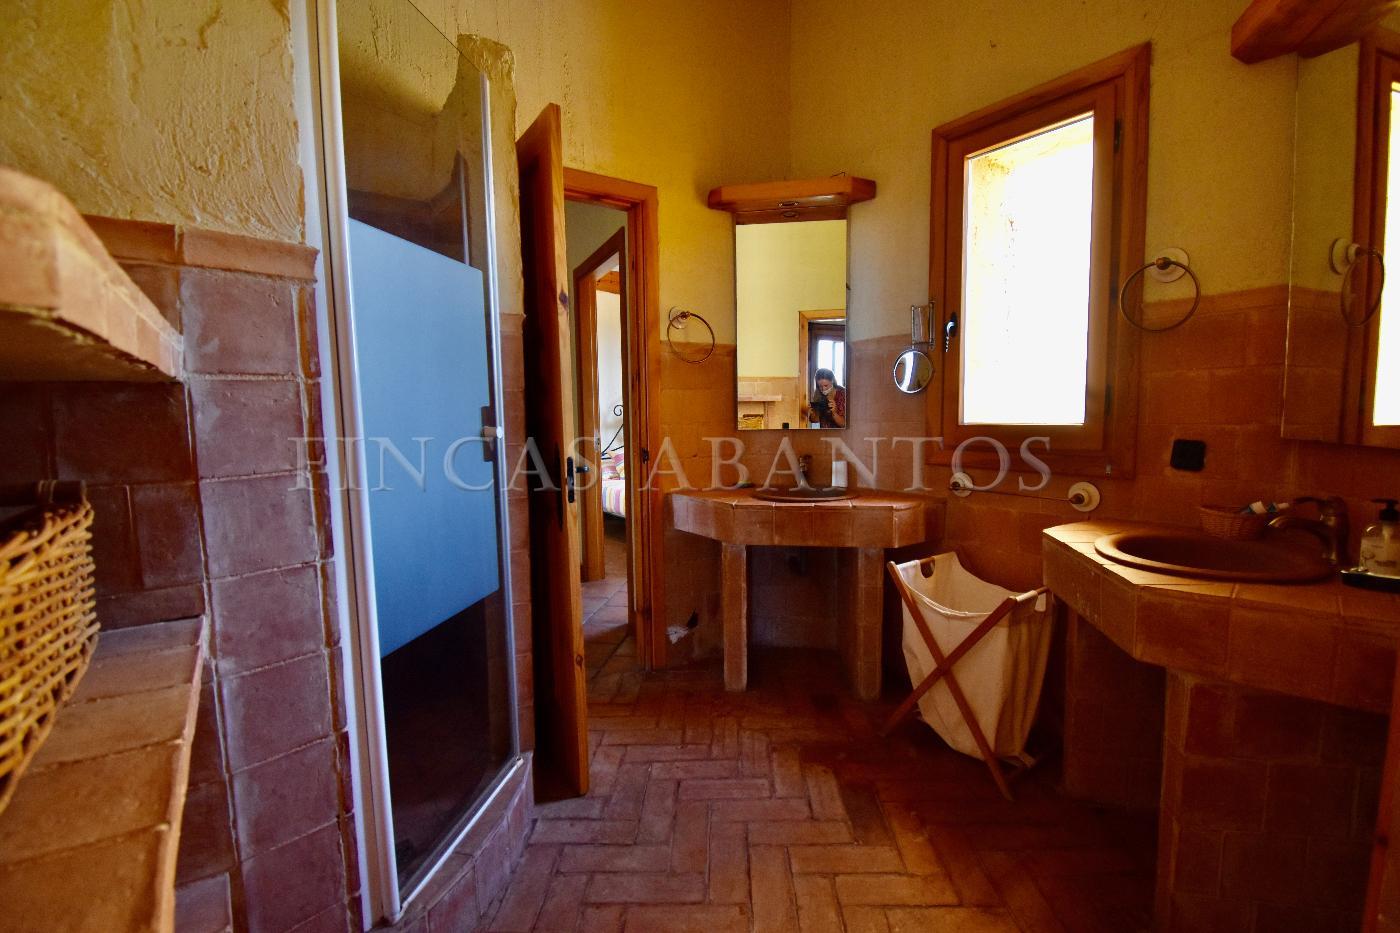 For sale of chalet in Valdemorillo